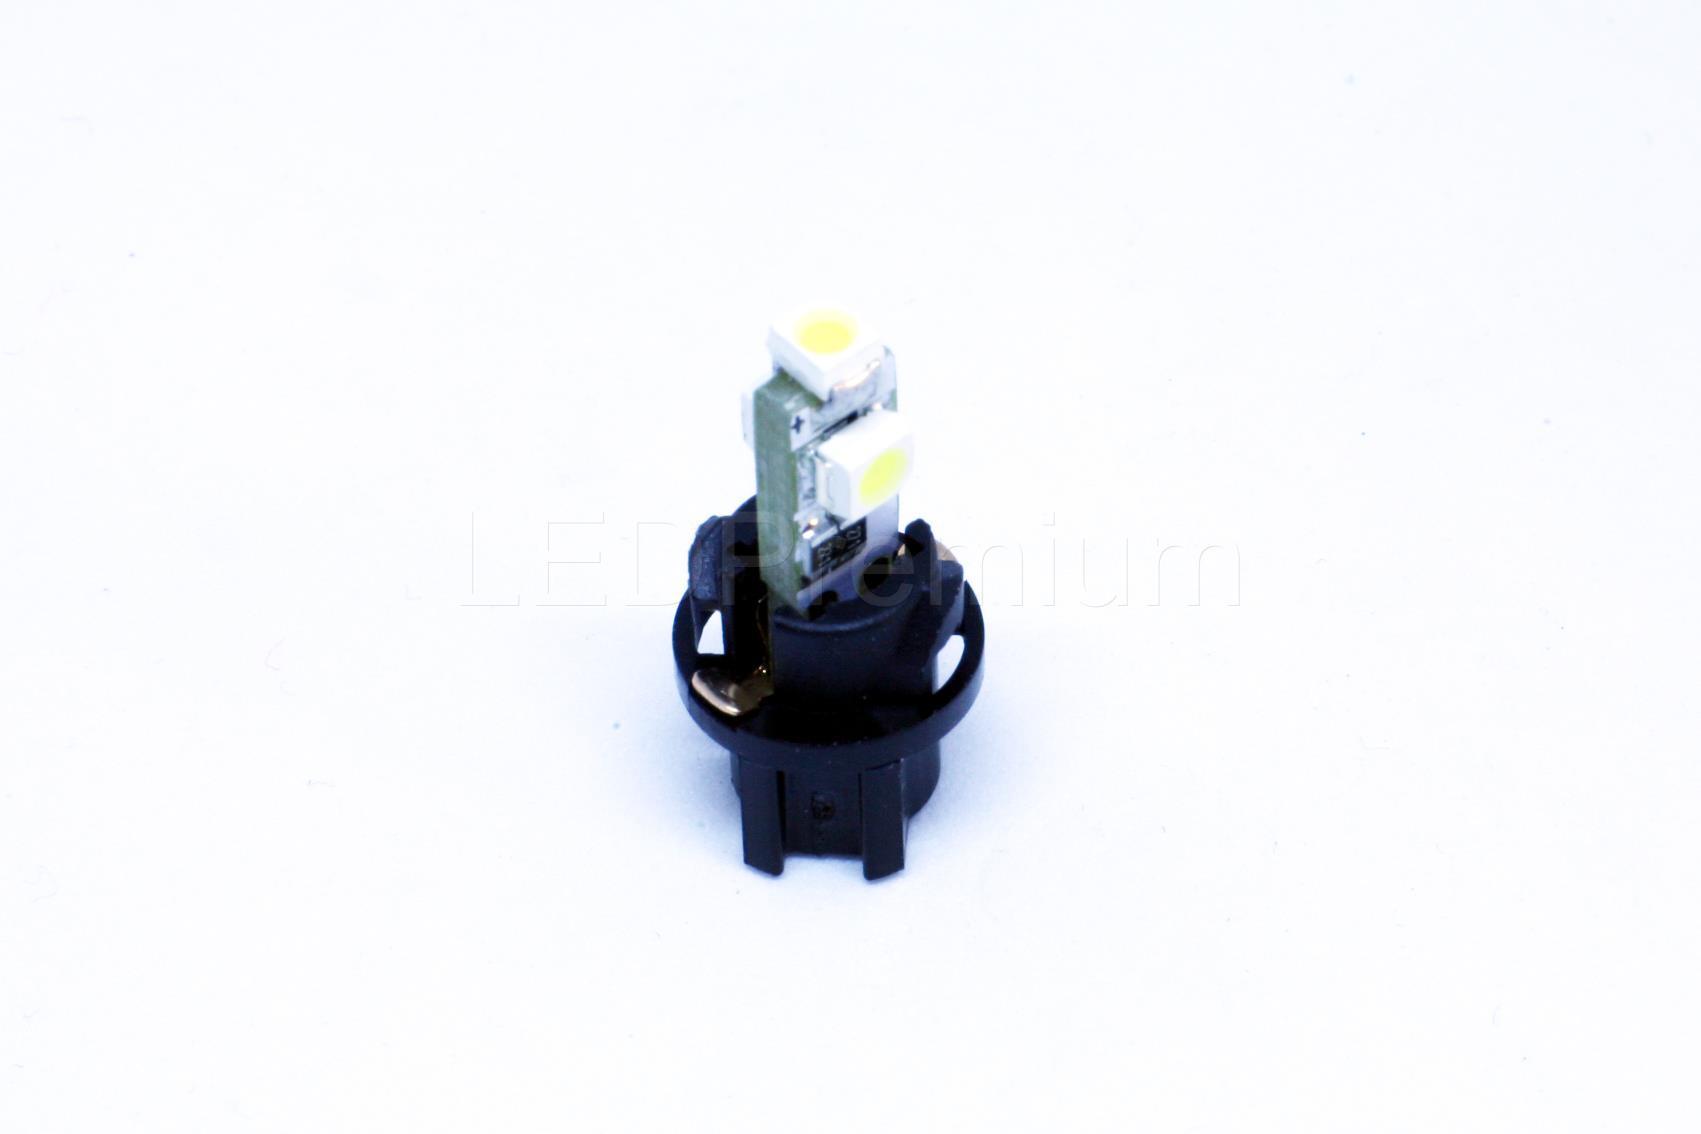 10x SOCKETS TOSHIBA V-2 TSD DASH REPLACEMENT 10x BULBS T5 SMD LED